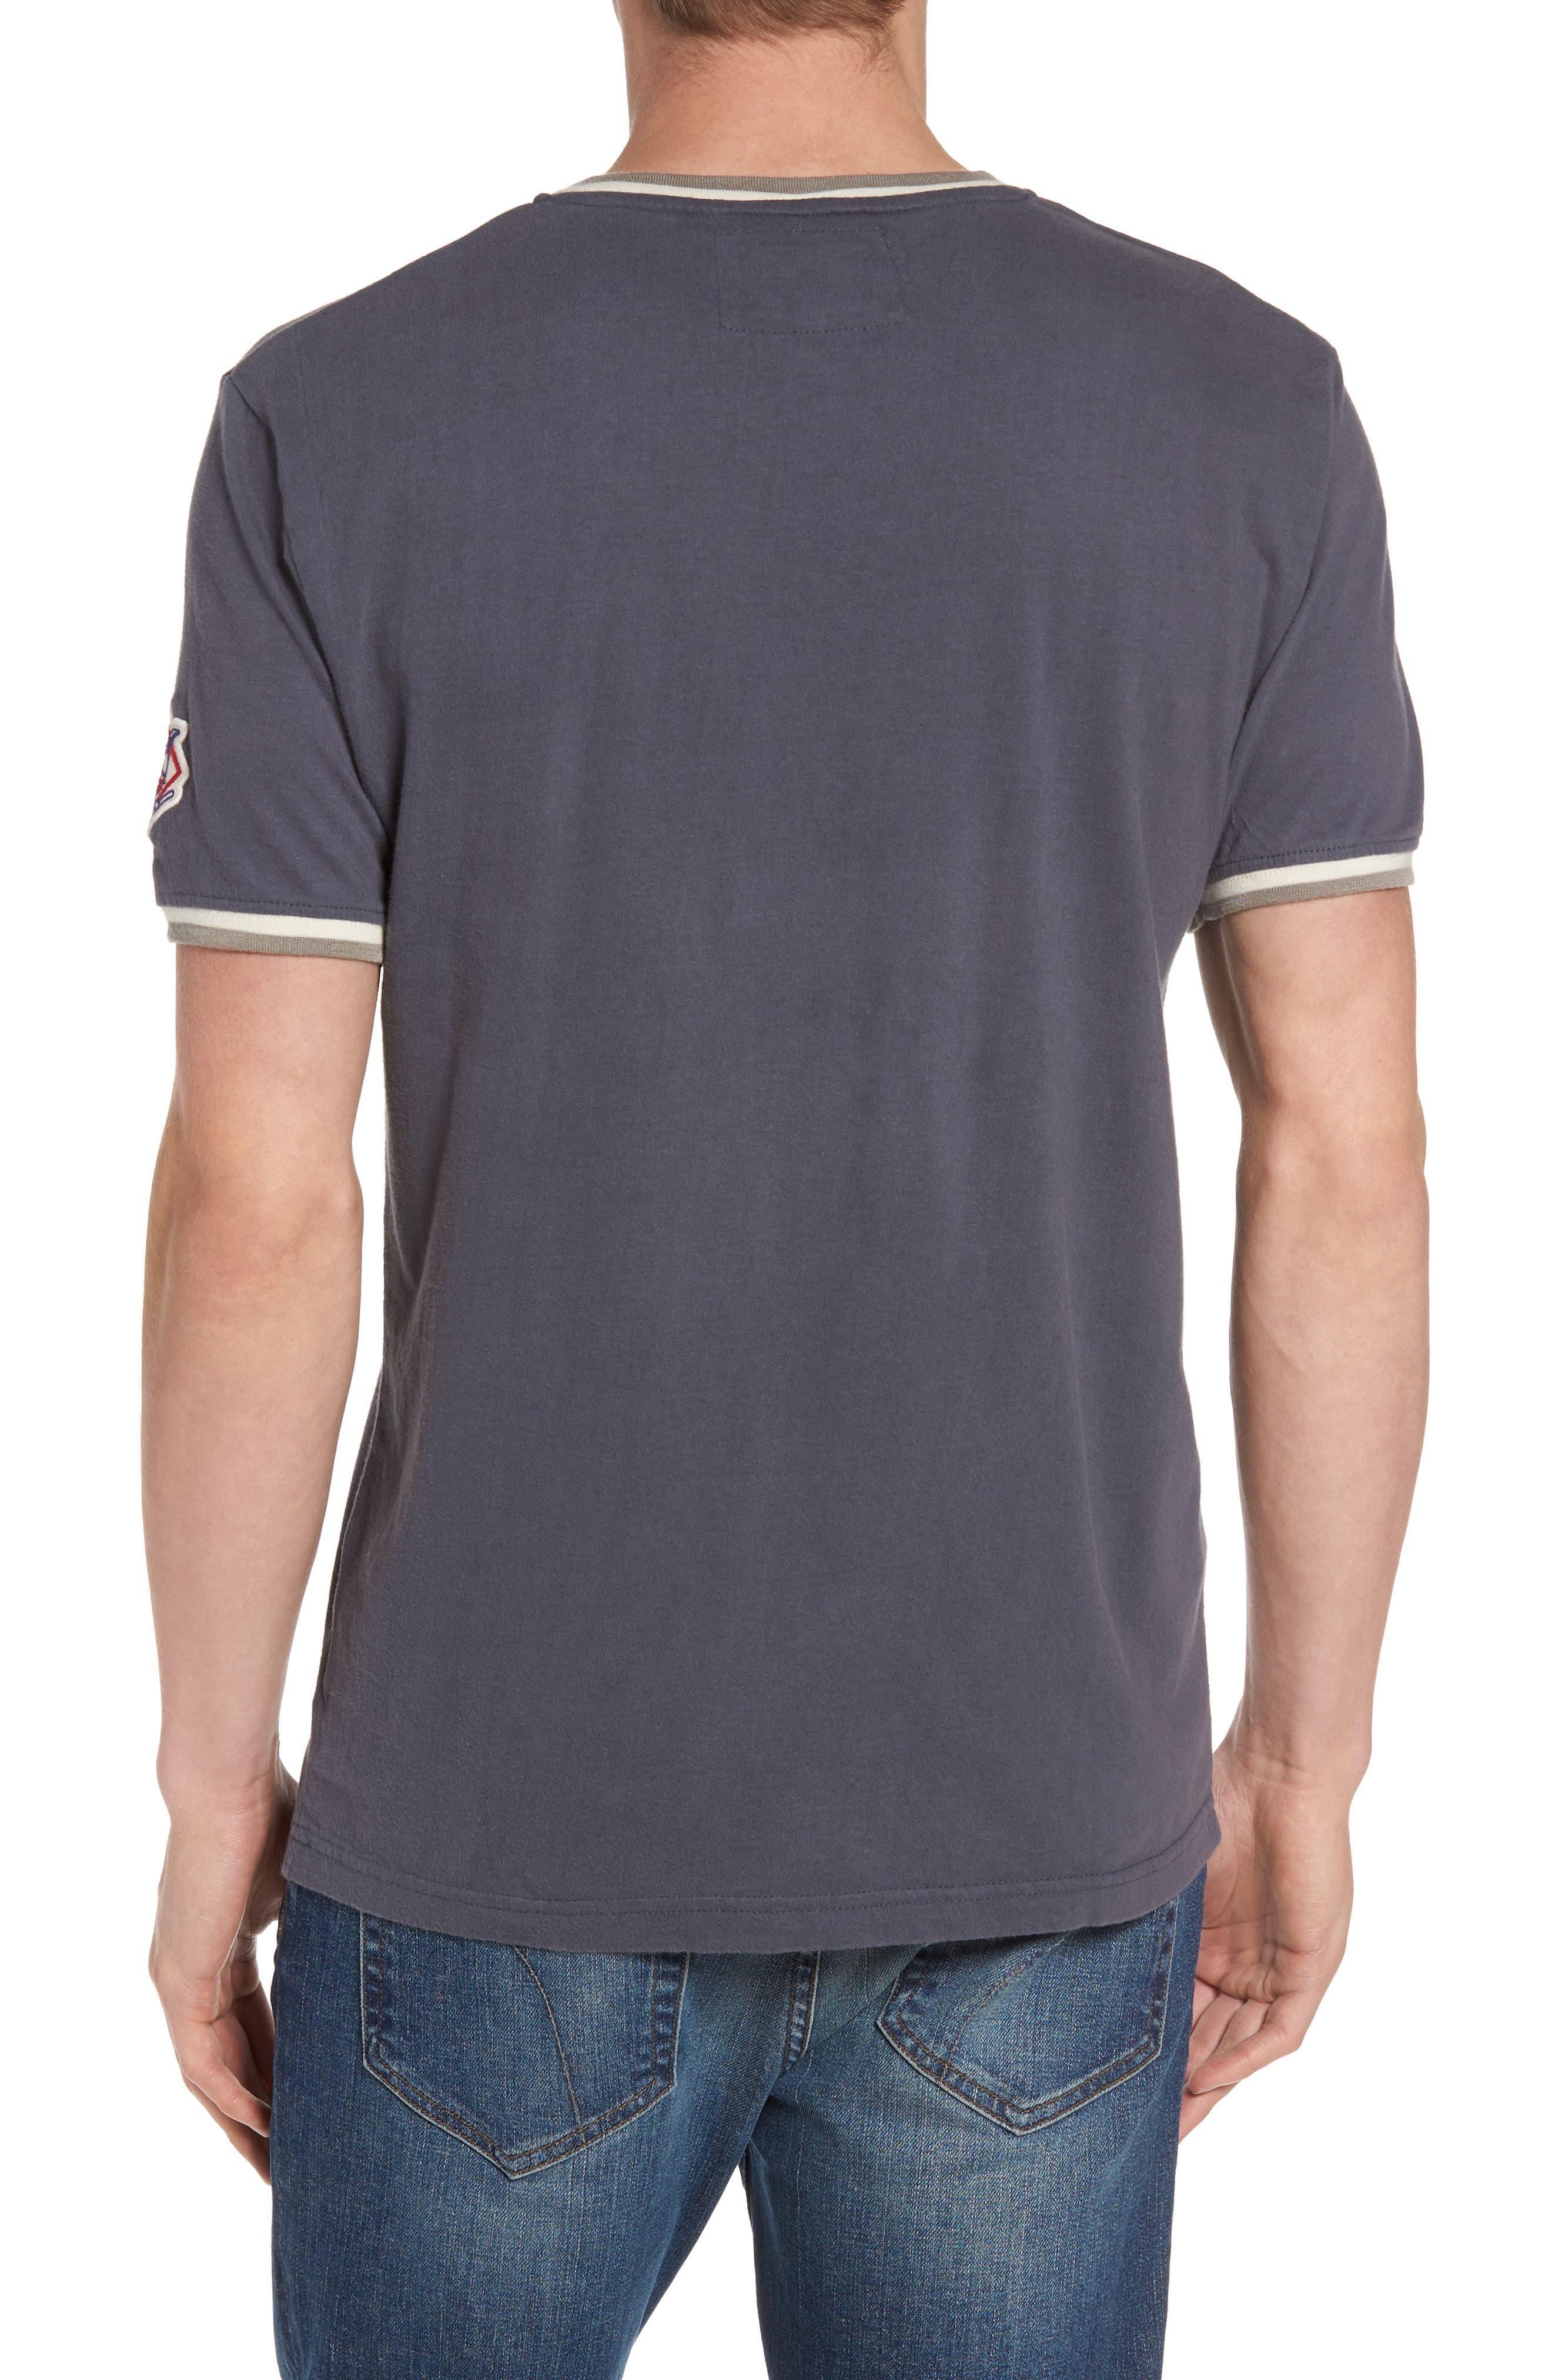 Eastwood - Chicago Cubs V-Neck T-Shirt,                             Alternate thumbnail 2, color,                             410